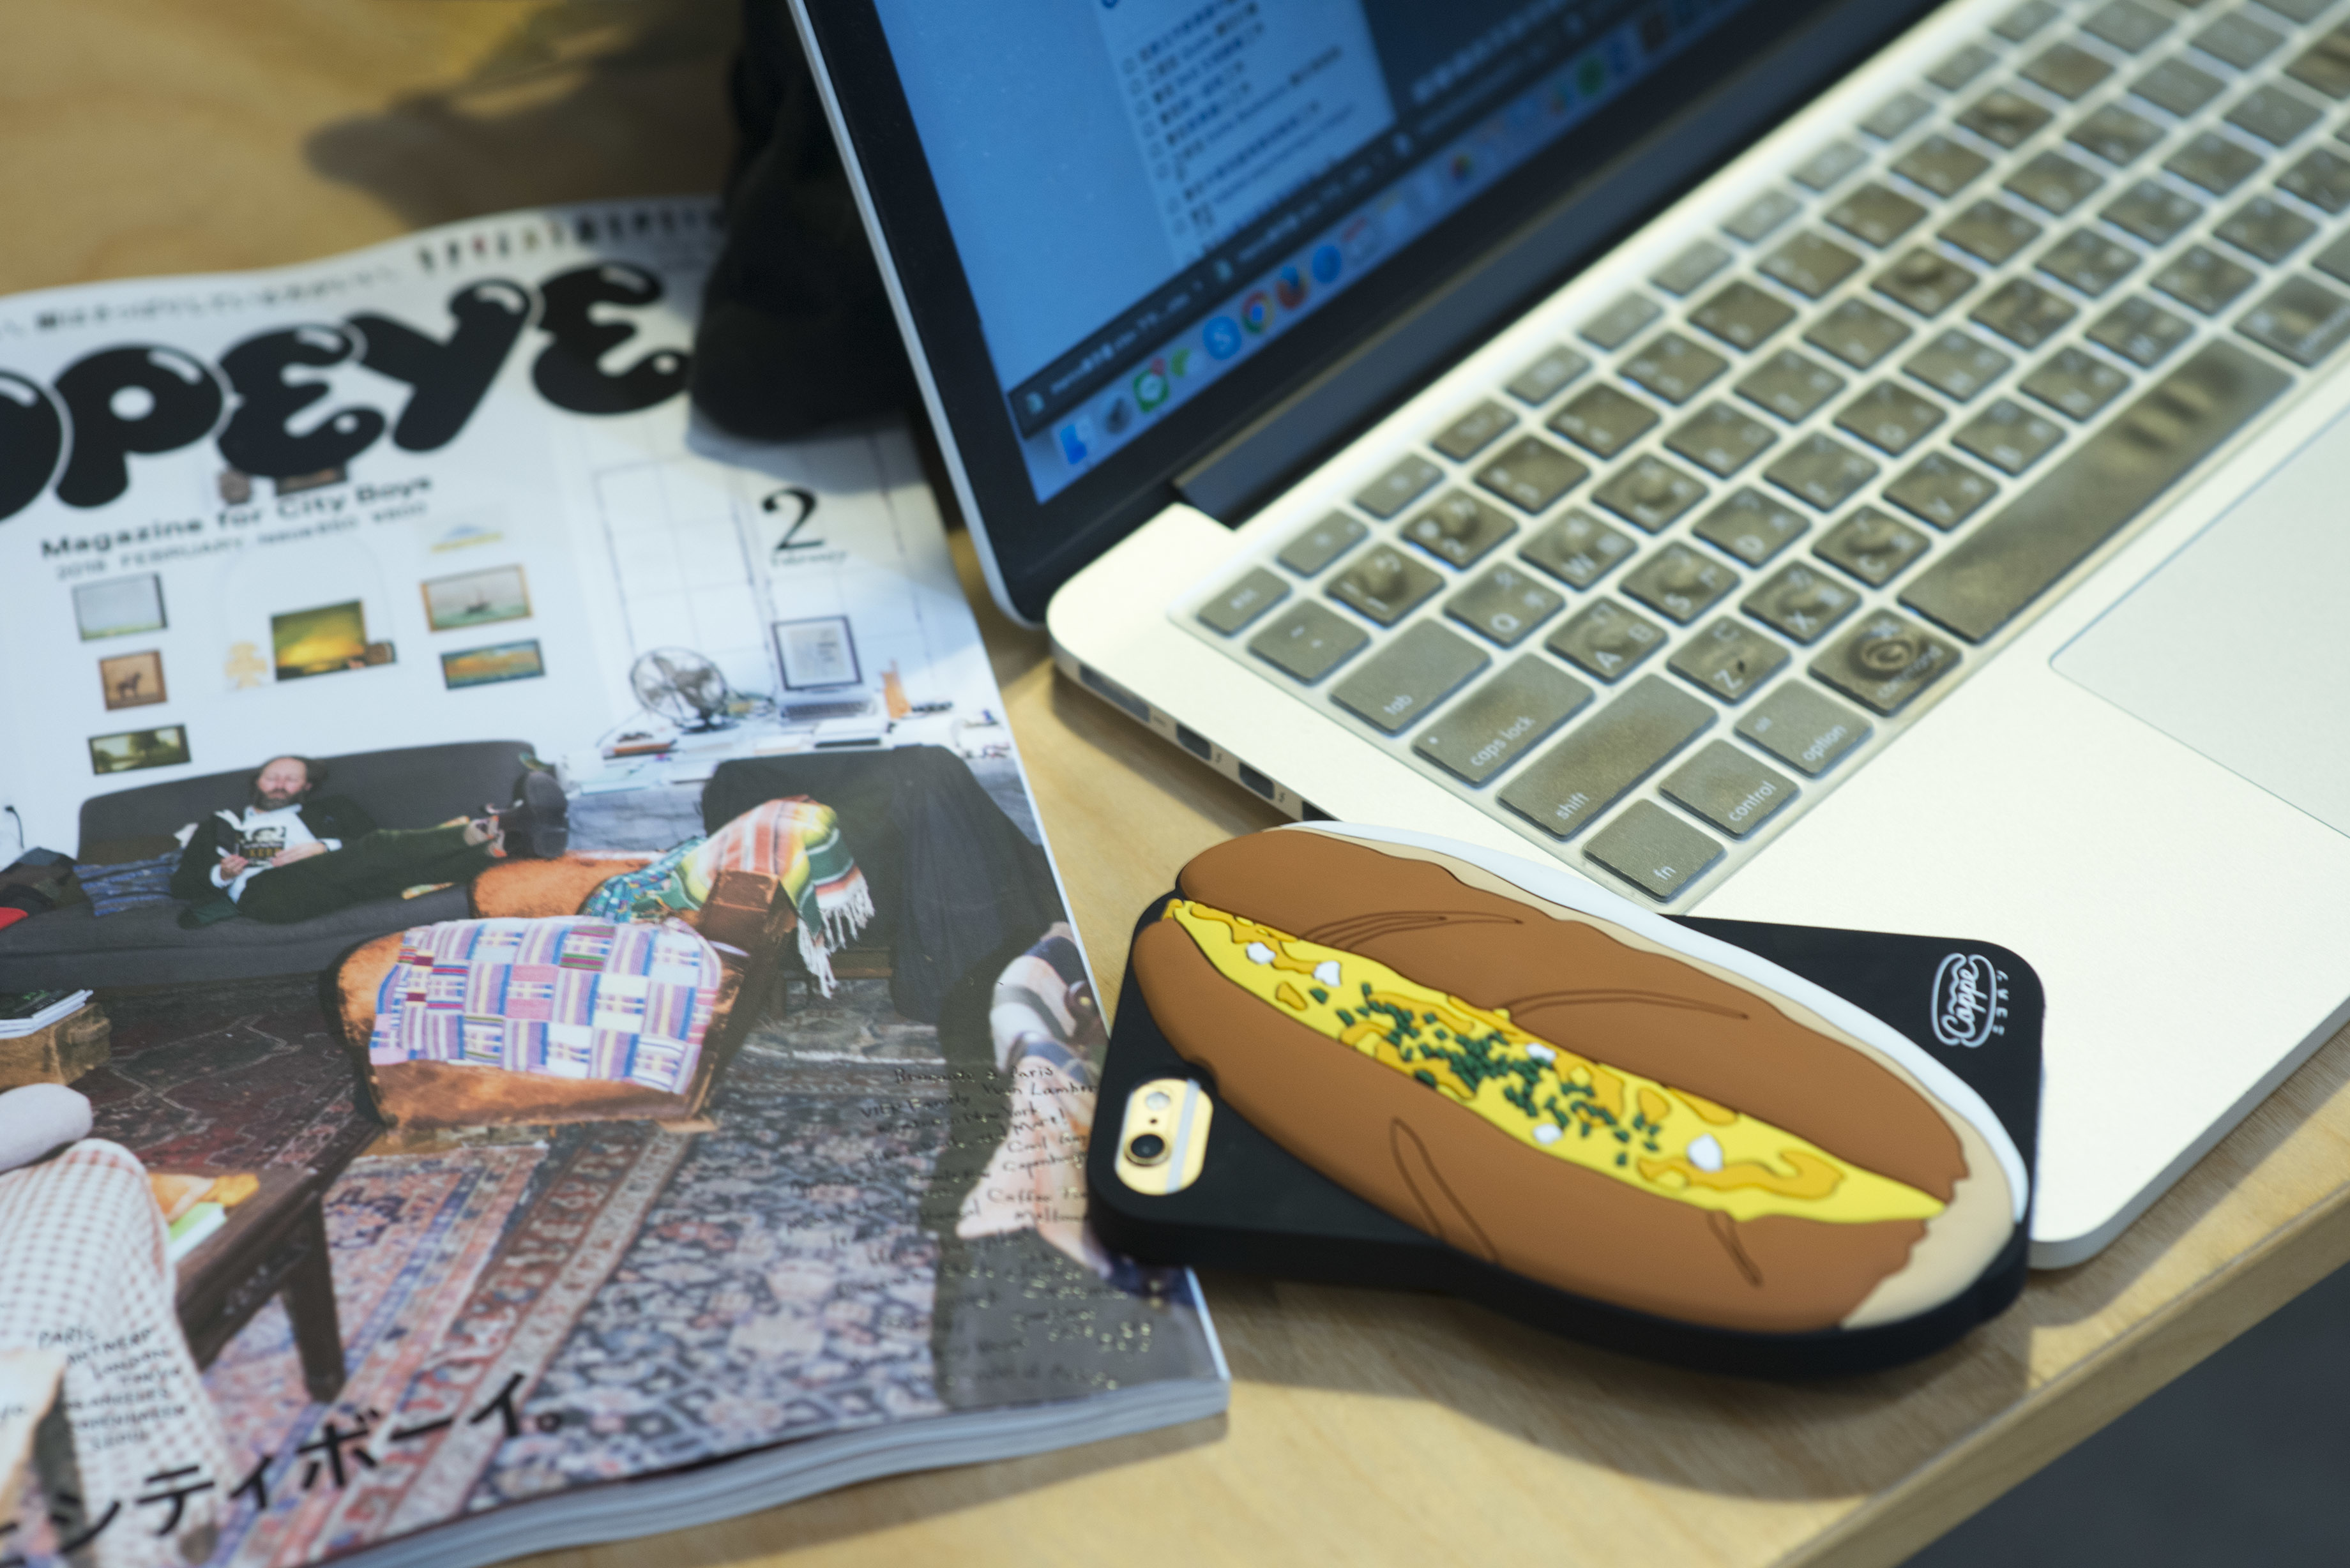 nozzle quiz 專訪 誠品生活松菸店,一個單身男子的房間快閃店主理人marco,設計人的辦公桌。